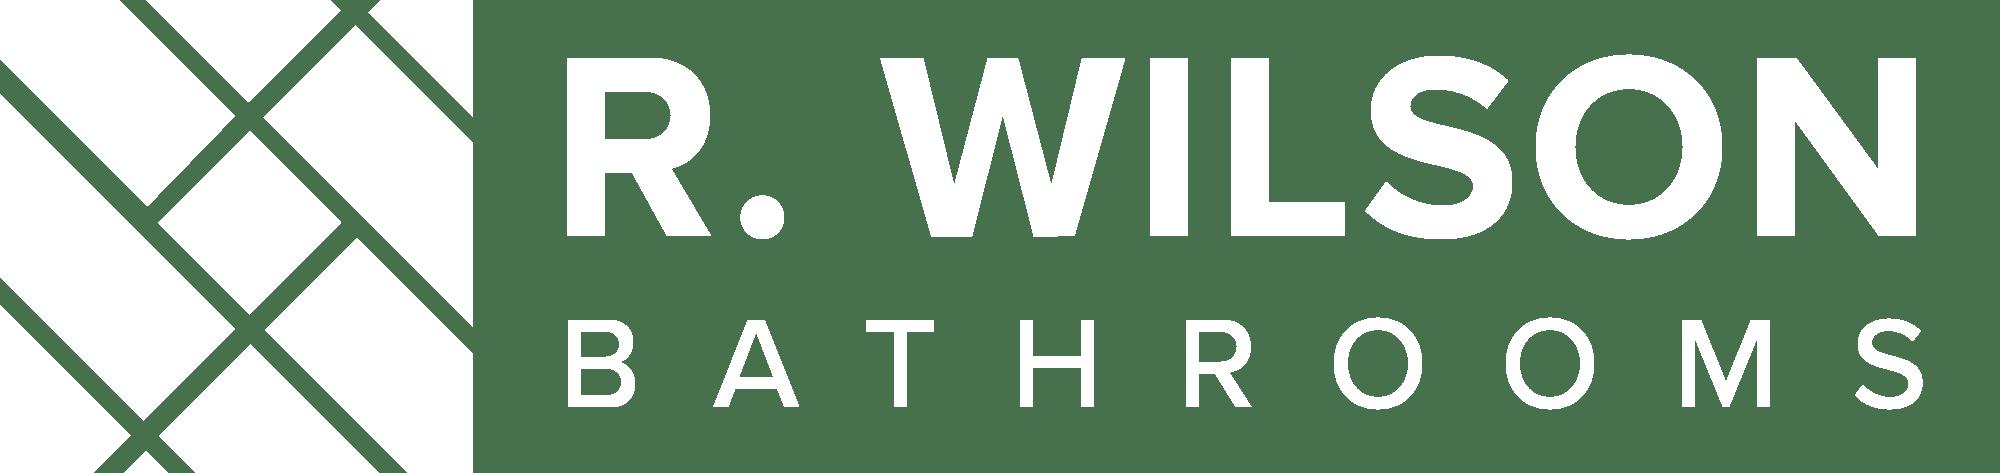 R. Wilson Bathrooms